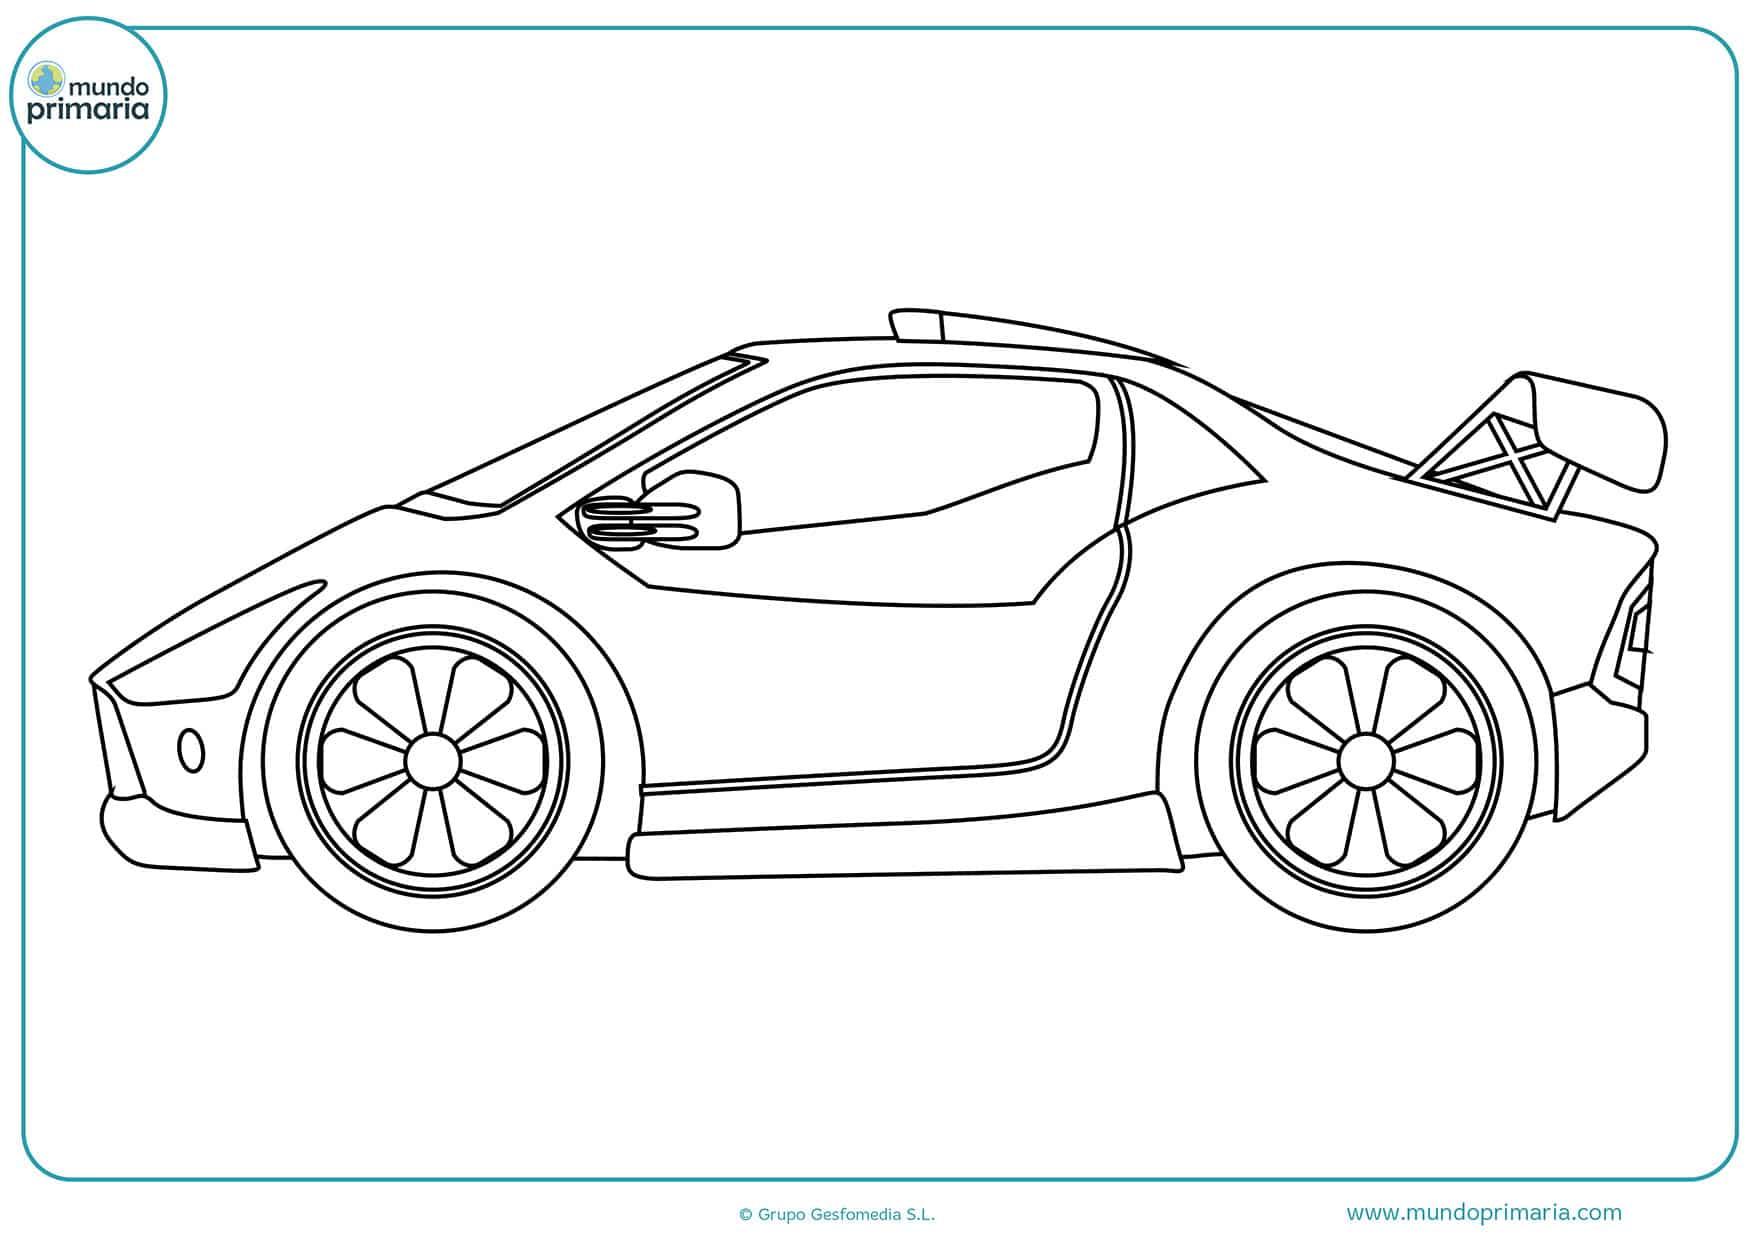 Dibujos de coches para colorear - Mundo Primaria